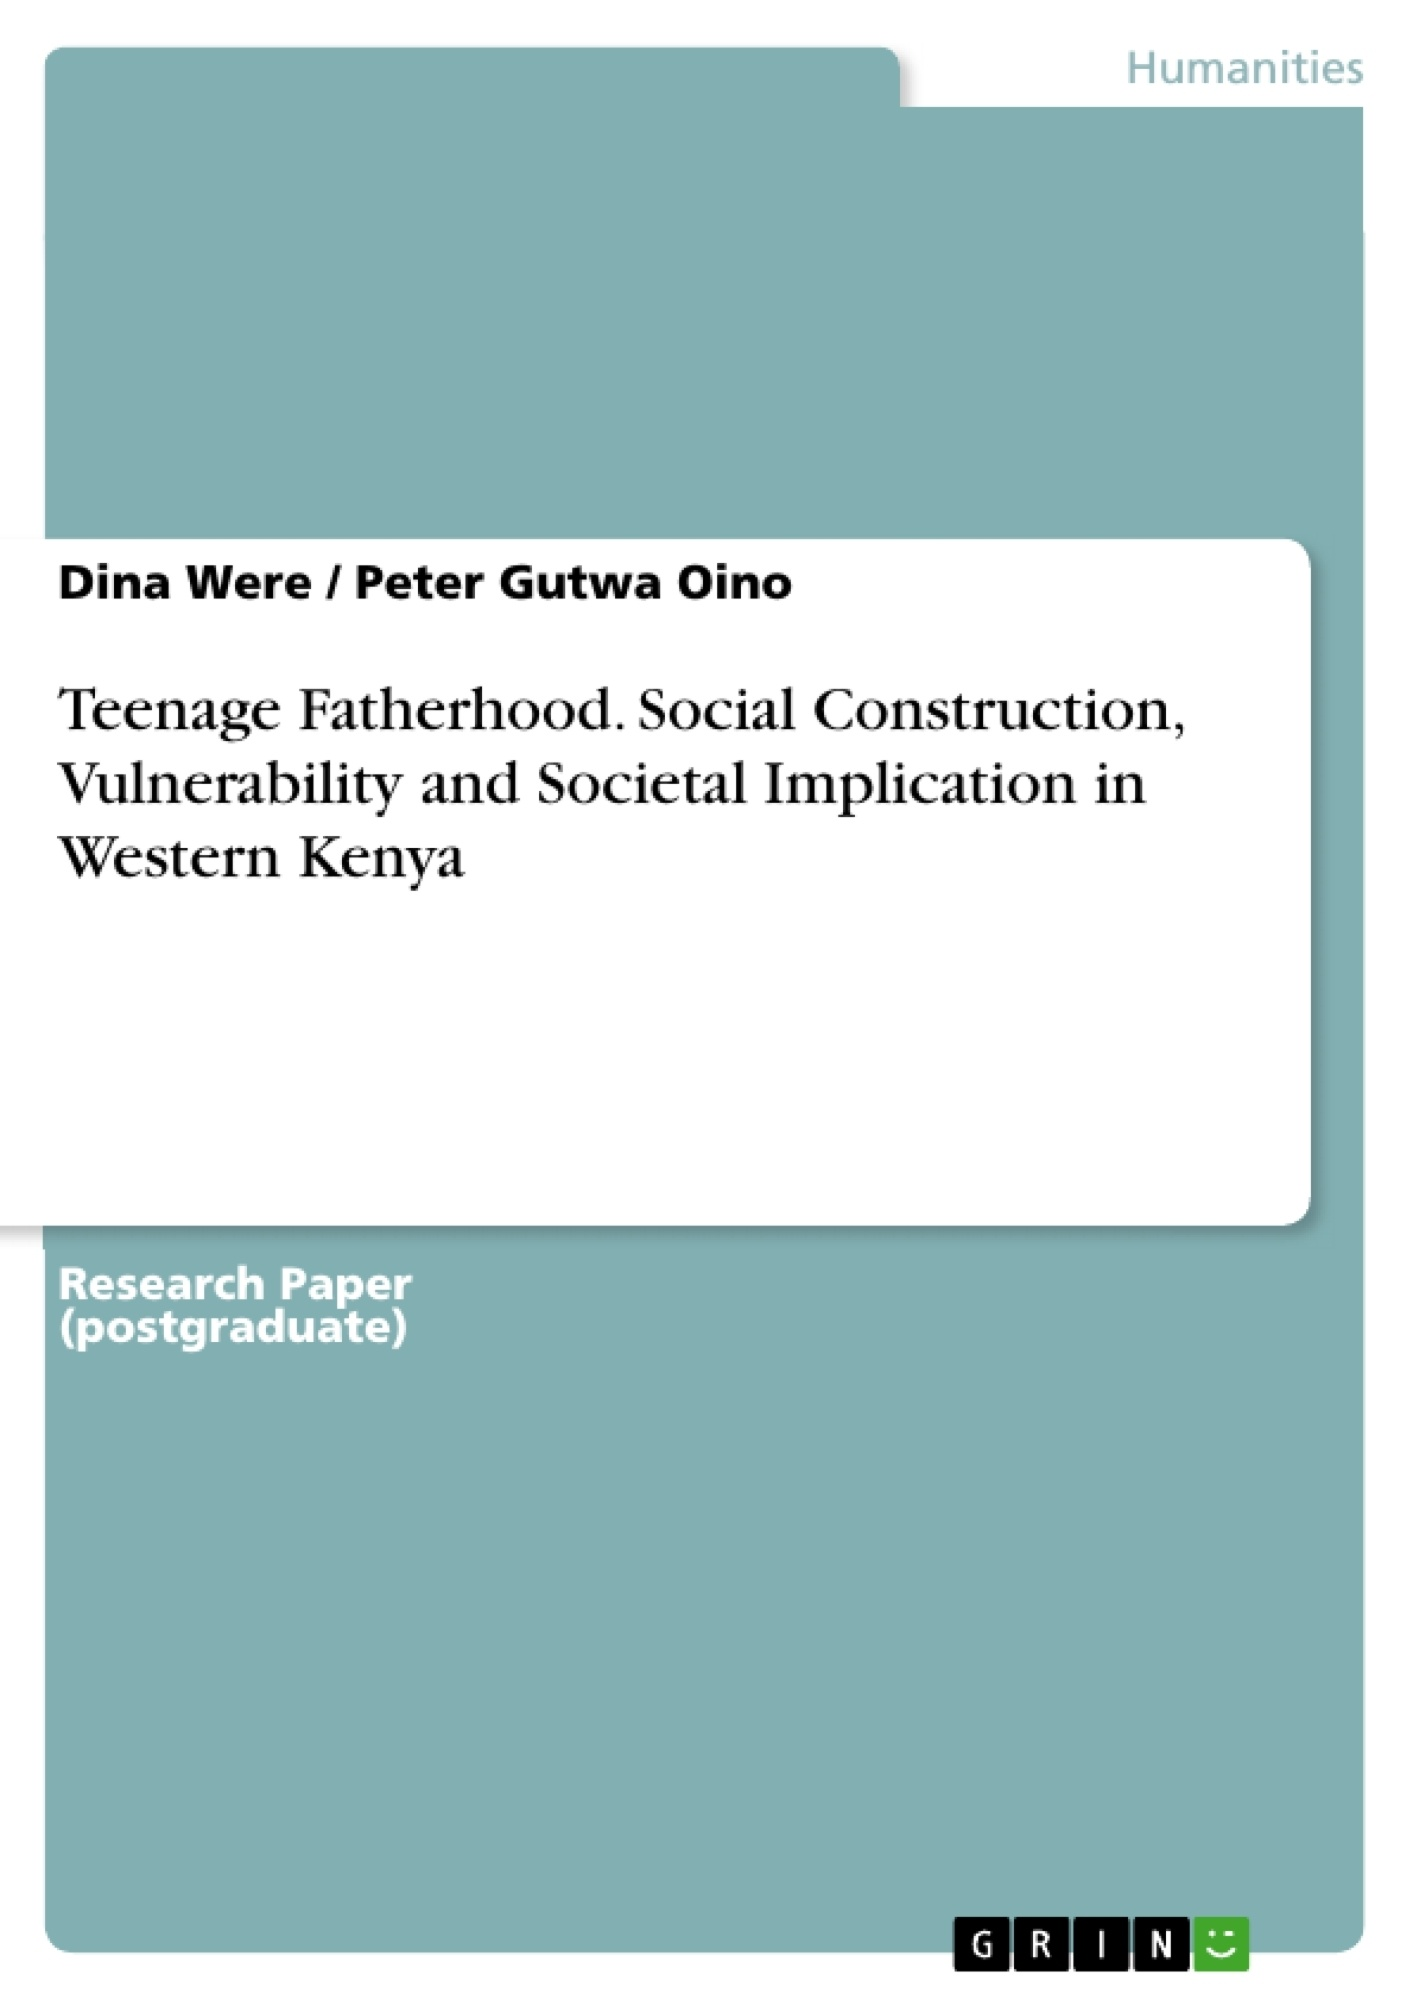 Title: Teenage Fatherhood. Social Construction, Vulnerability and Societal Implication in Western Kenya